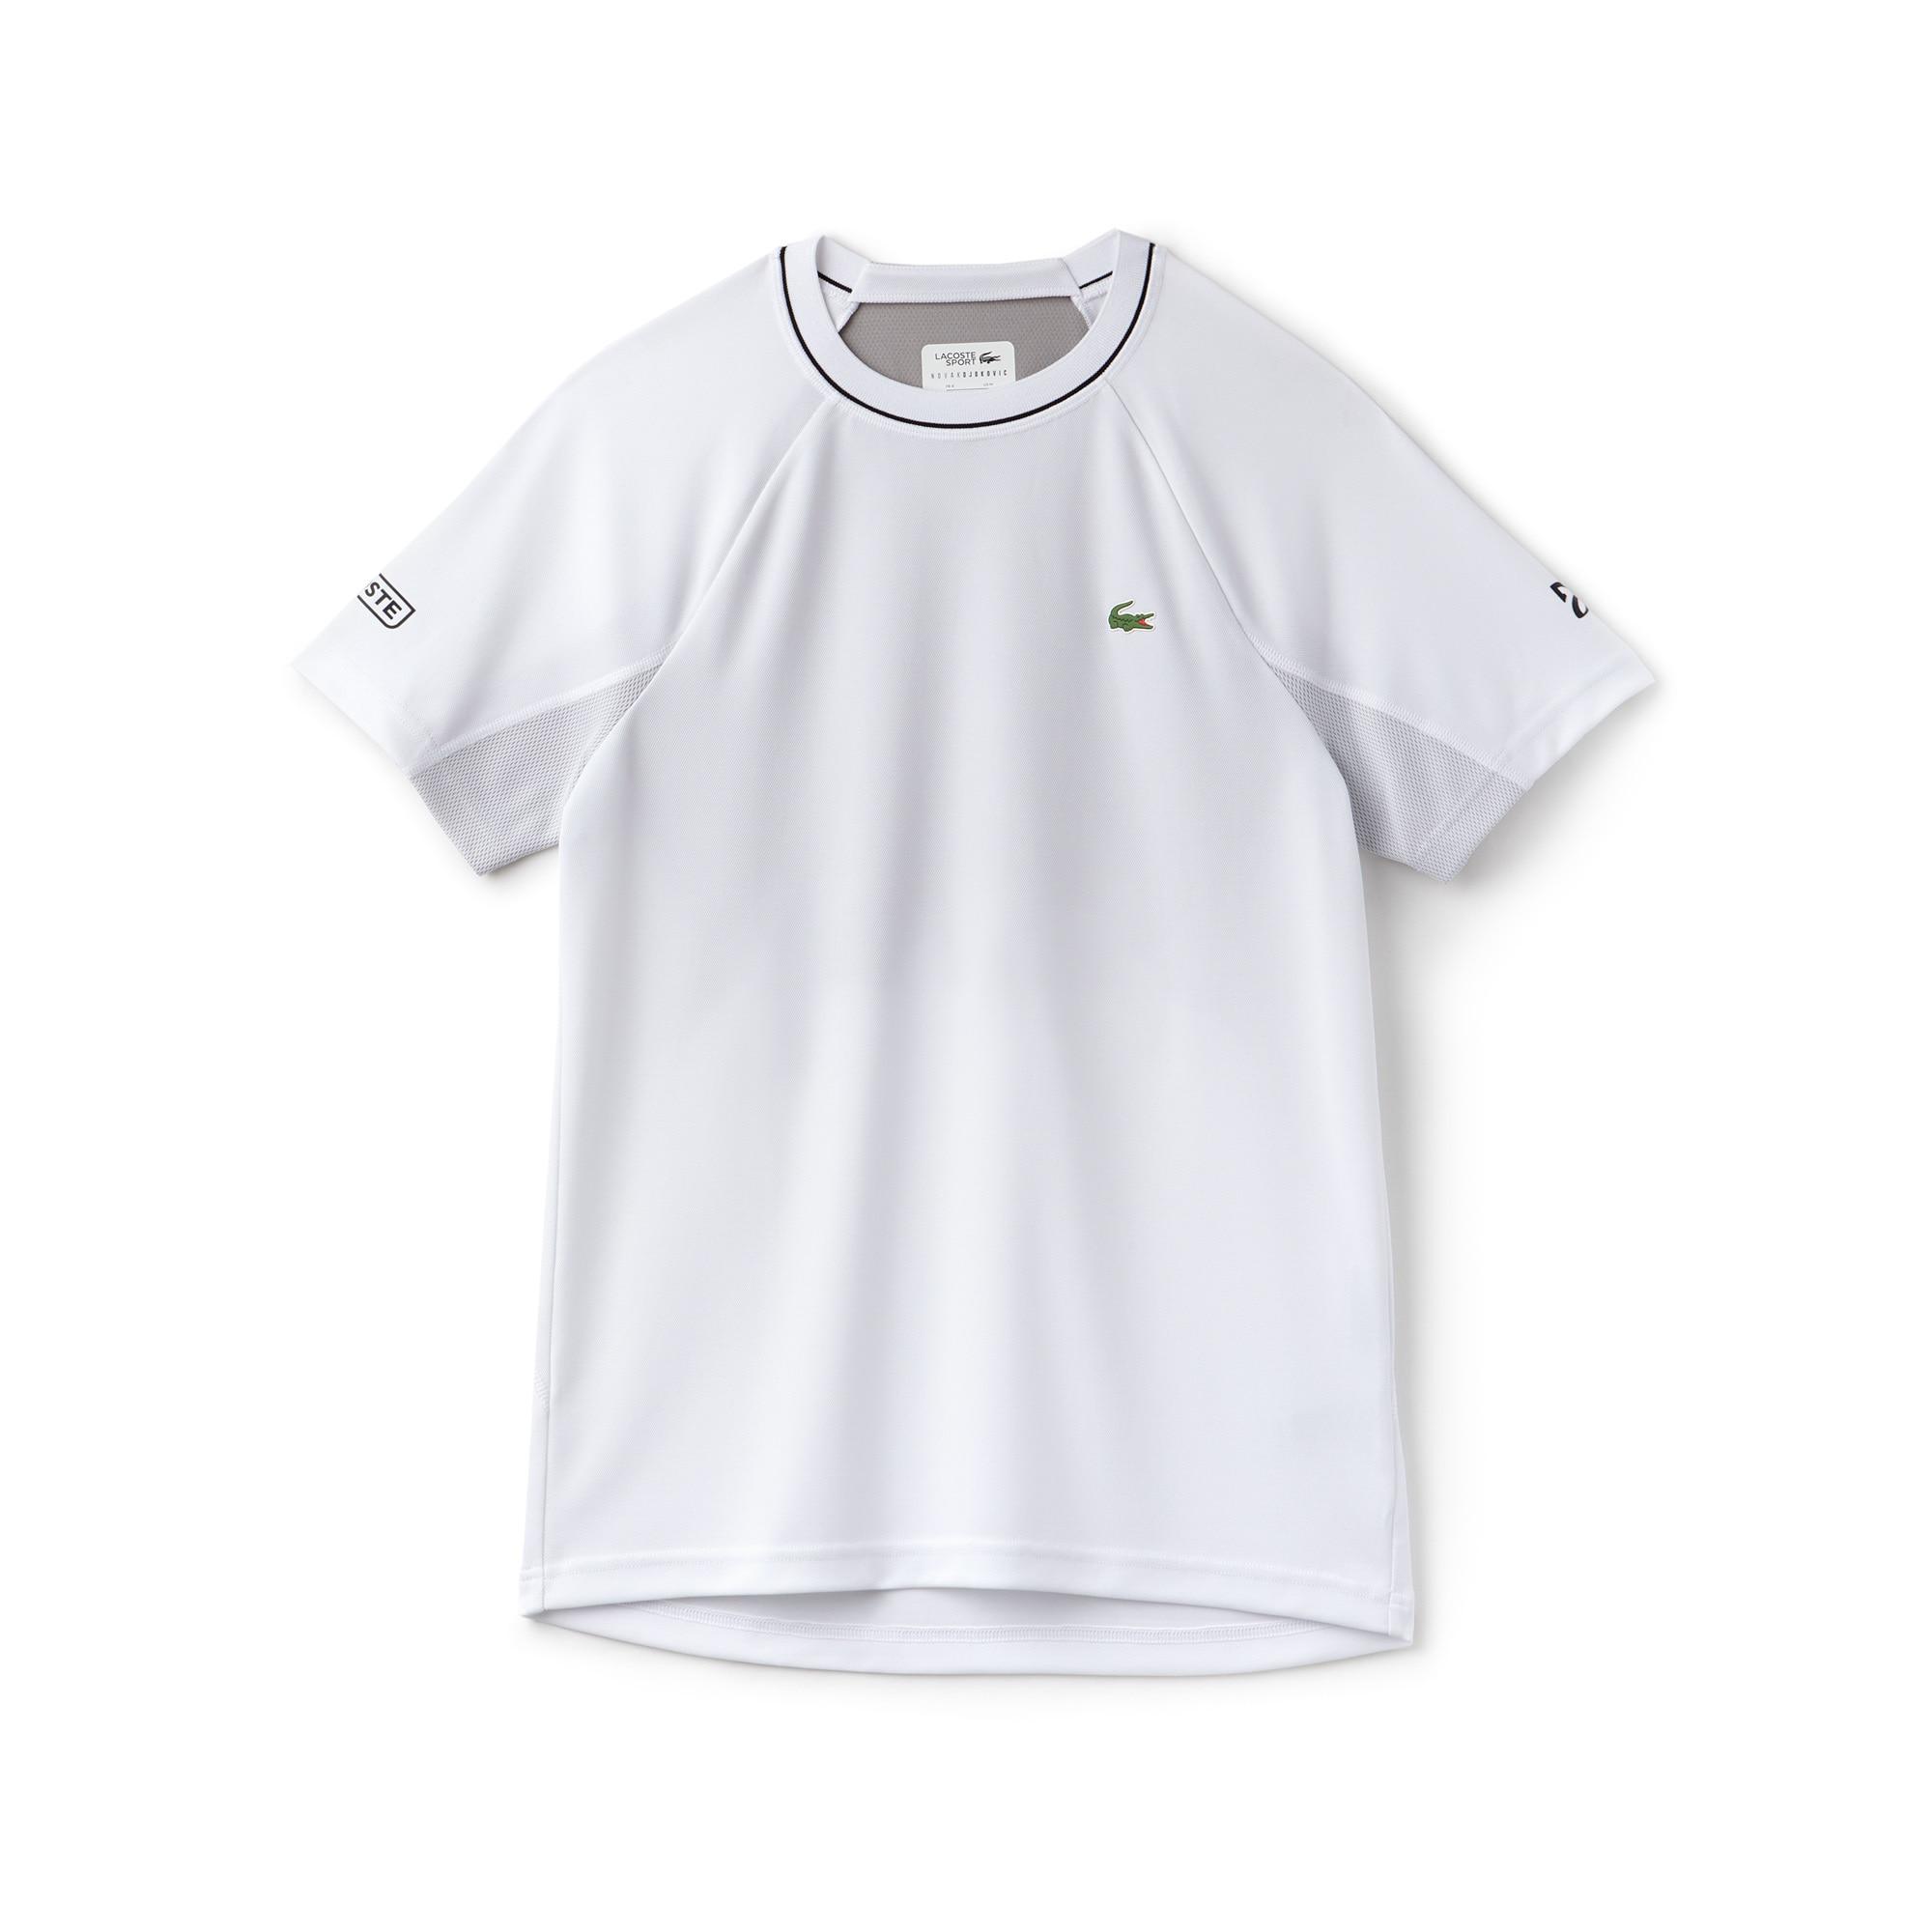 Herren-Rundhals-Shirt mit Mesh SPORT NOVAK DJOKOVIC Kollektion